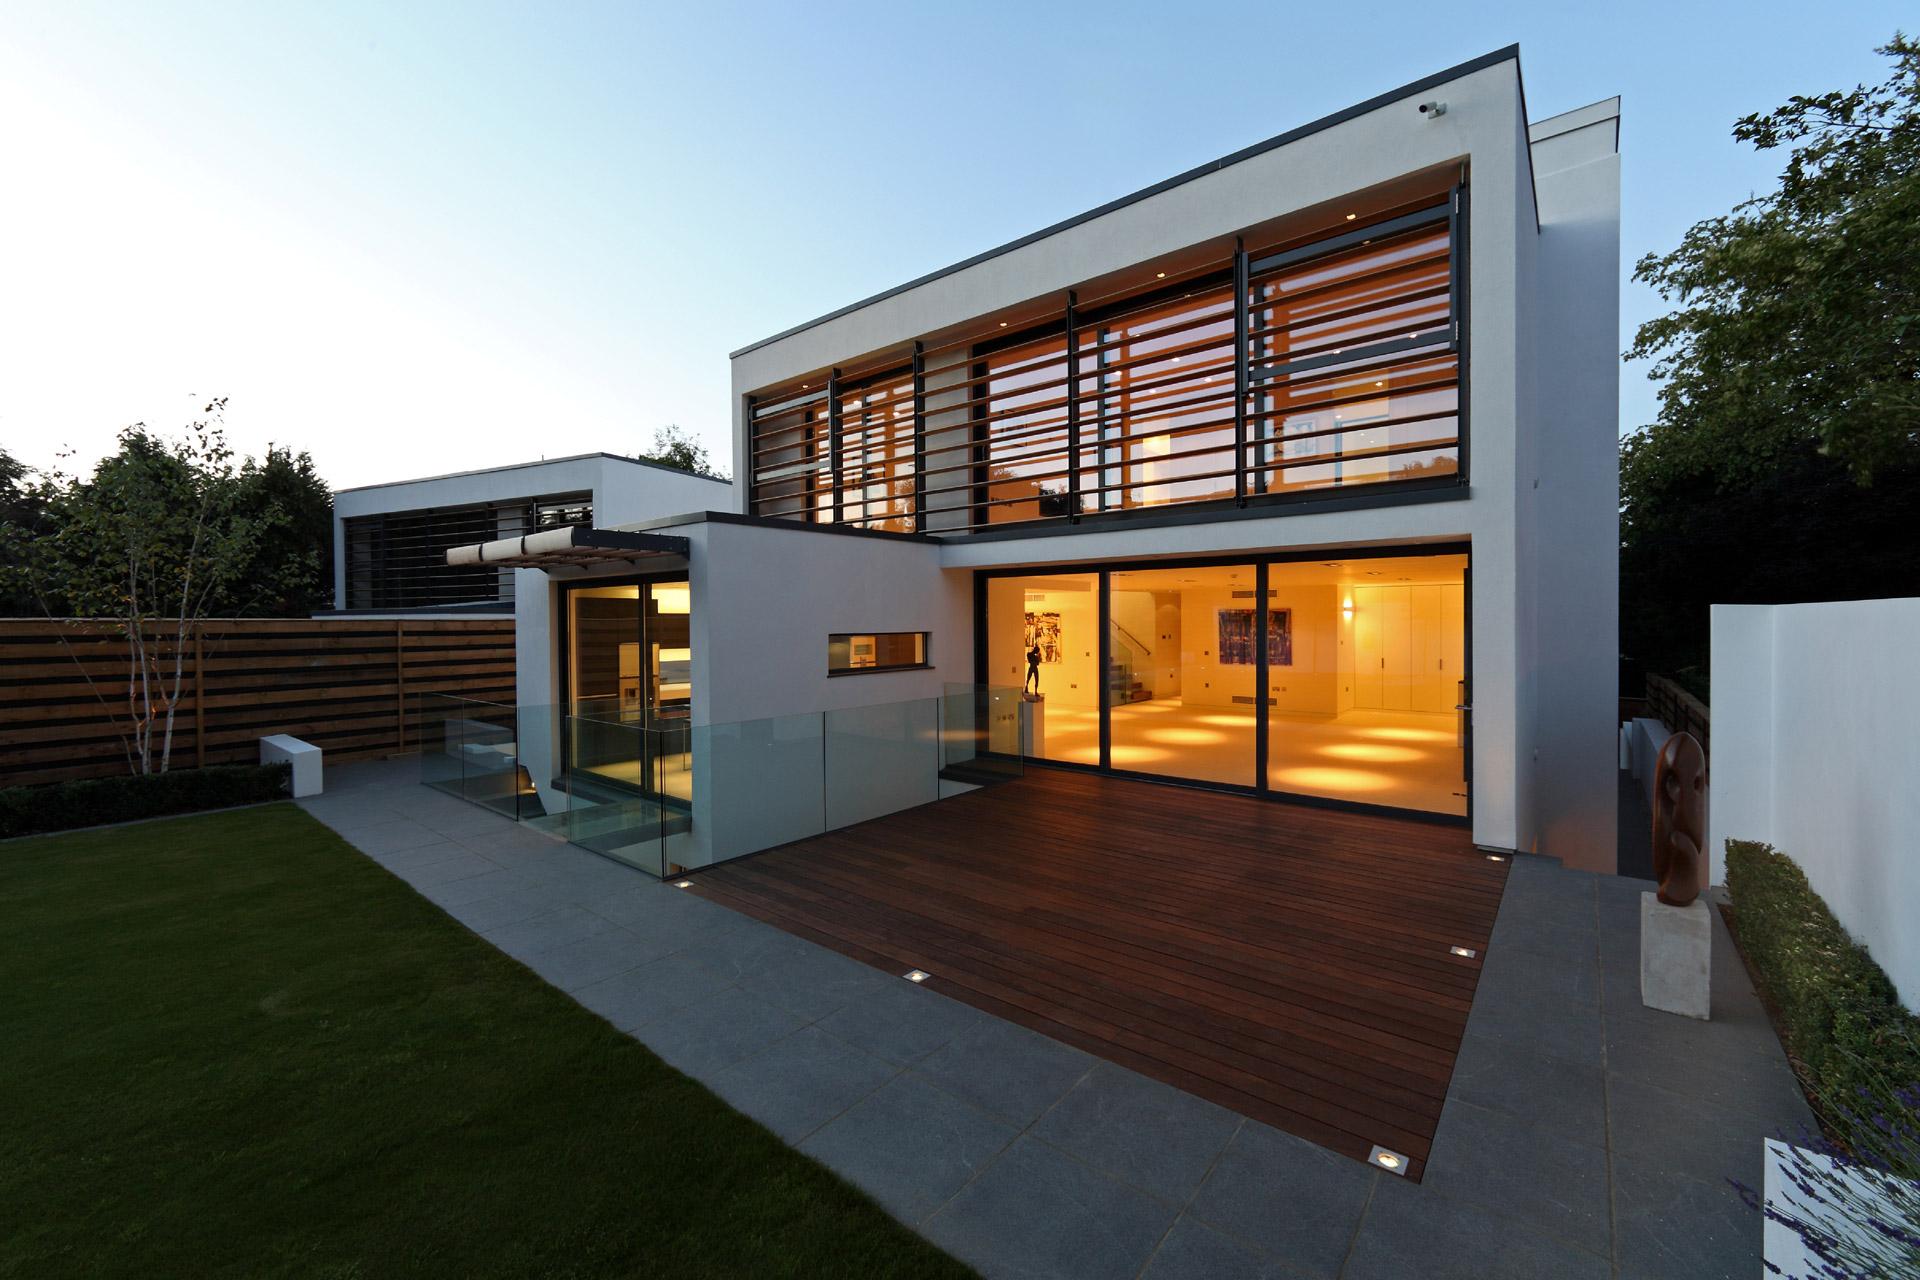 inspirational architect home design house floor ideas. Black Bedroom Furniture Sets. Home Design Ideas